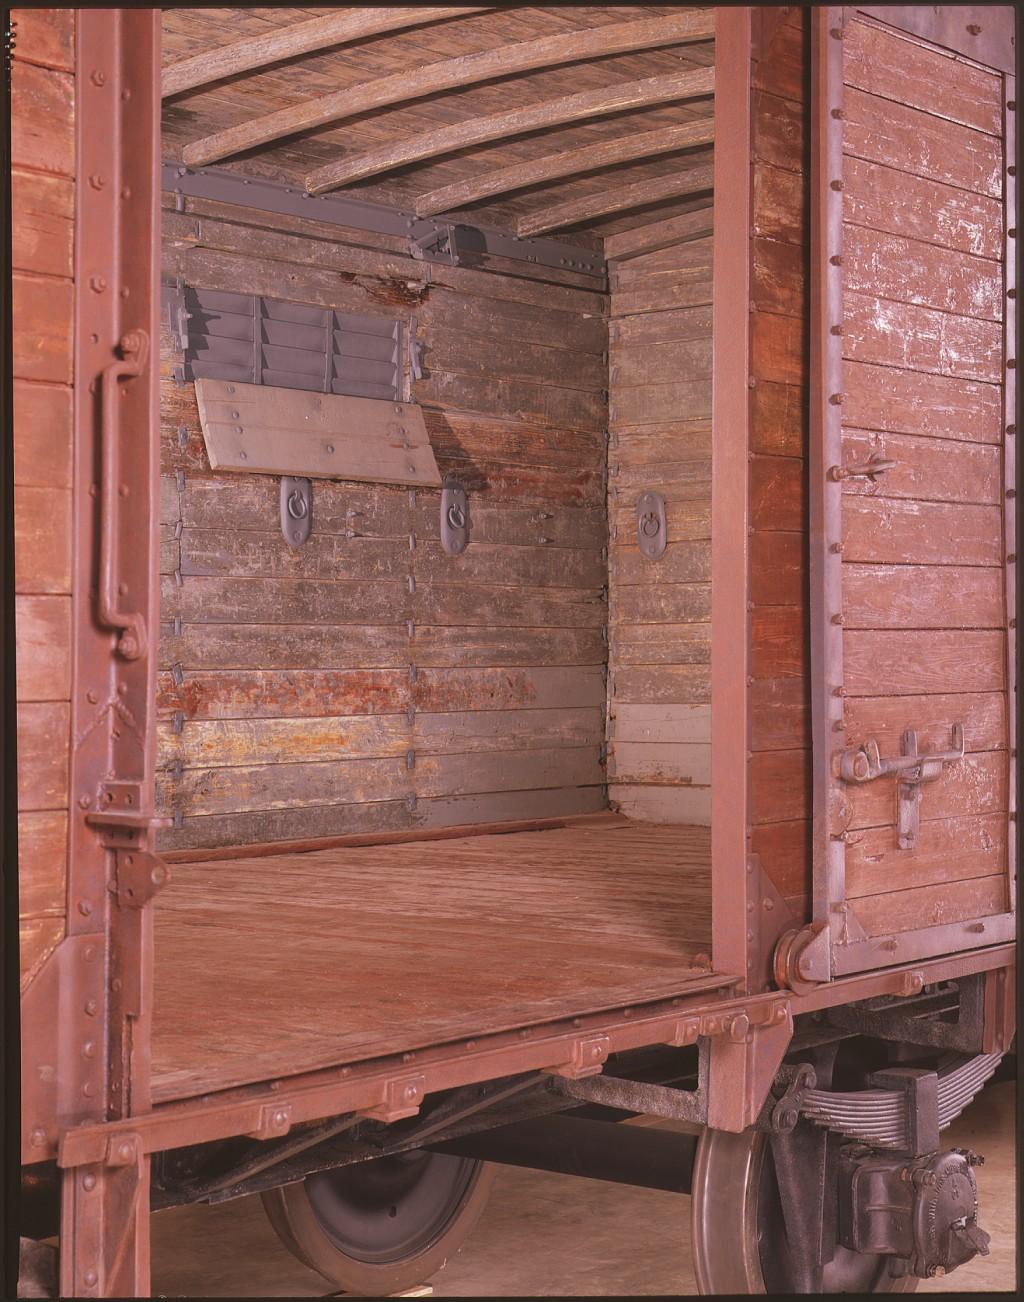 Railcar: Interior [LCID: 2012v3zk]